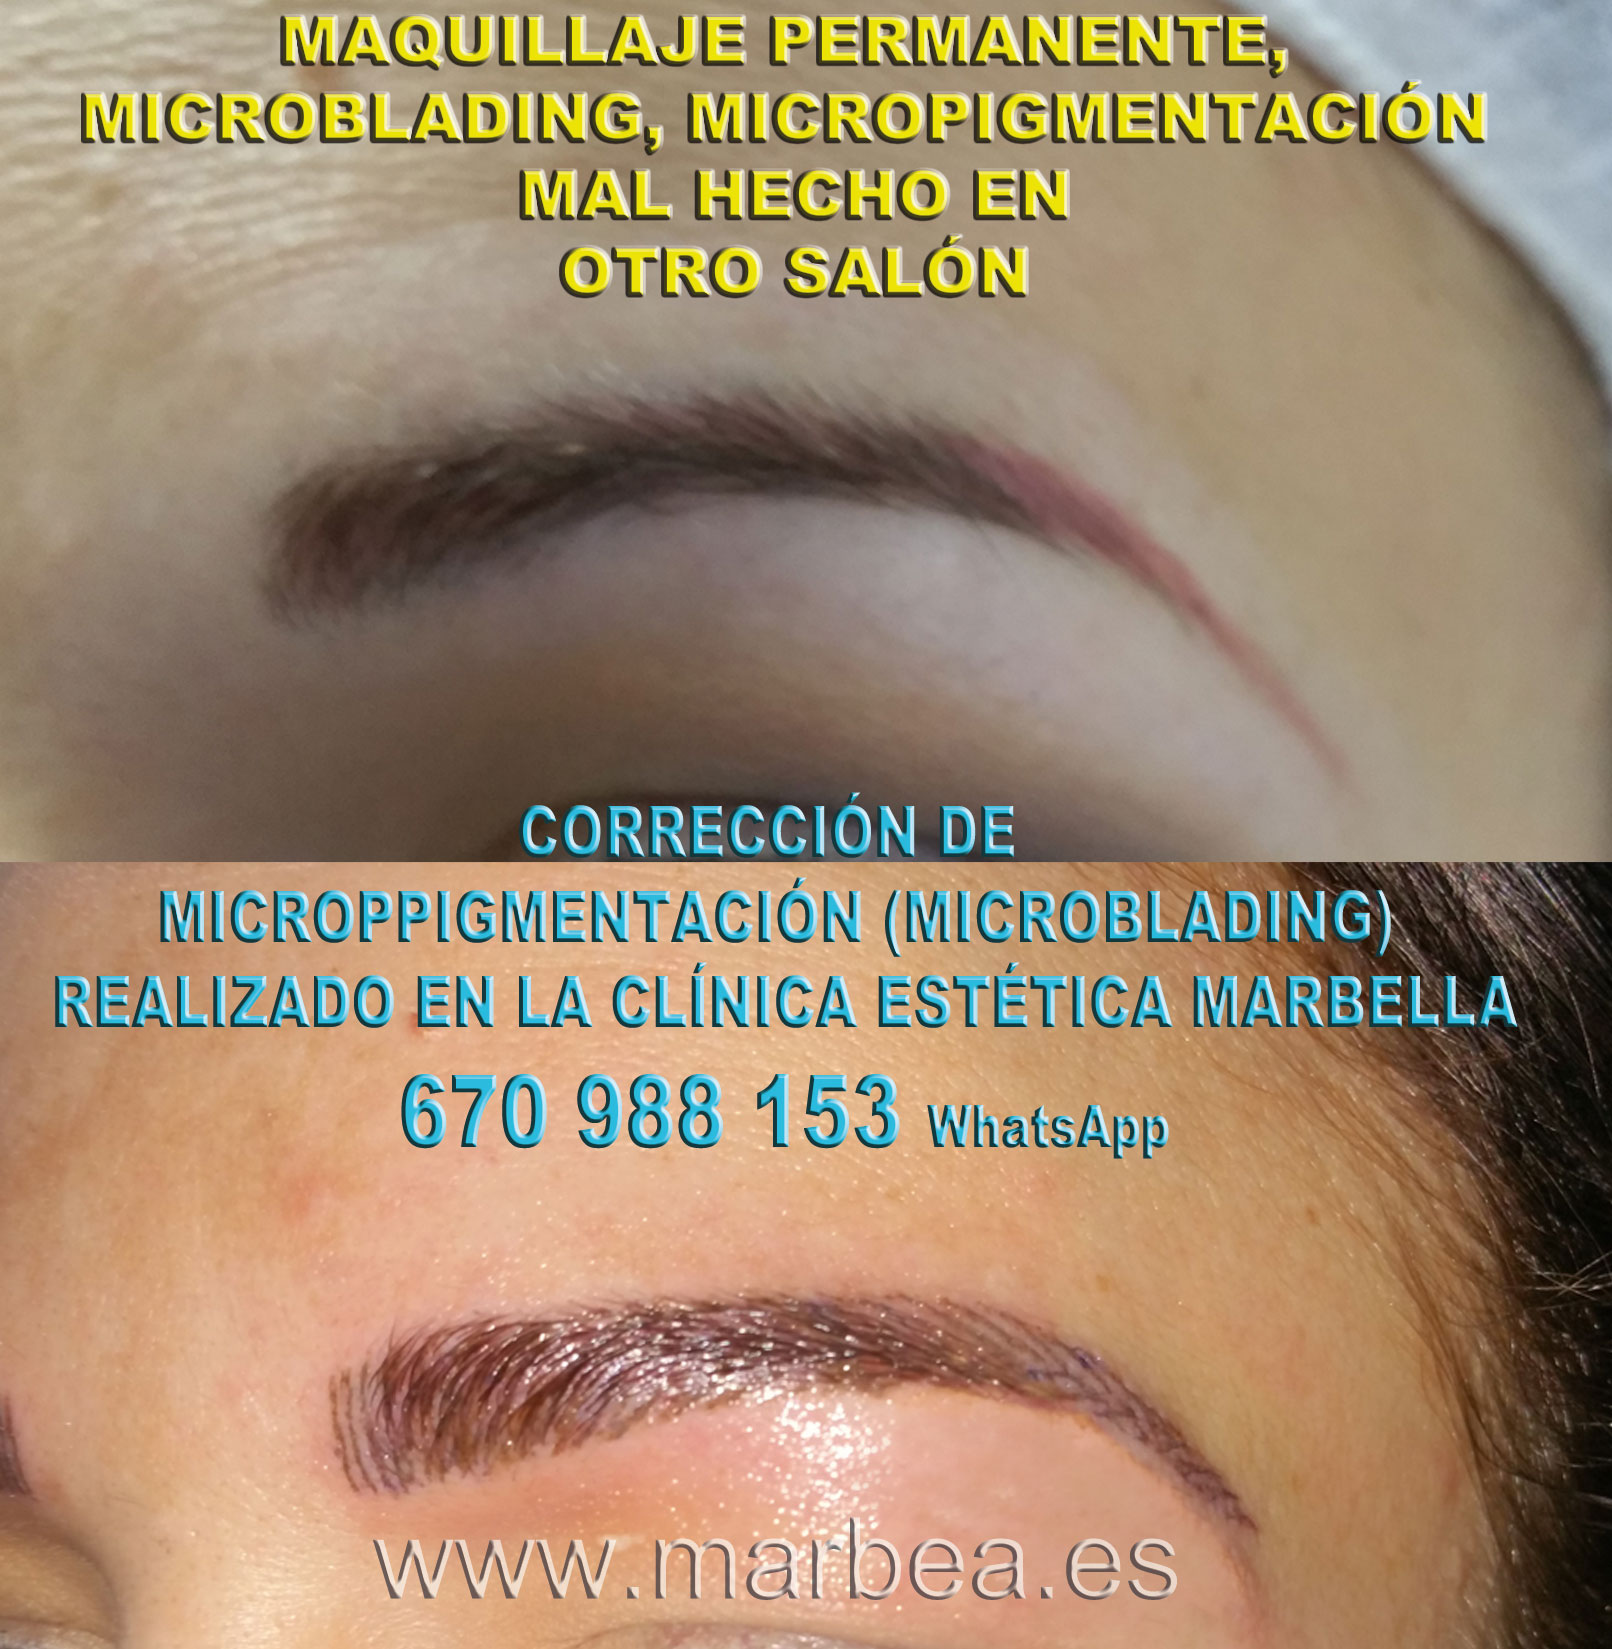 MAQUILLAJE PERMANENTE CEJAS MAL HECHO clínica estética microblading ofrenda micropigmentacion correctiva de cejas,micropigmentación correctiva cejas mal hecha